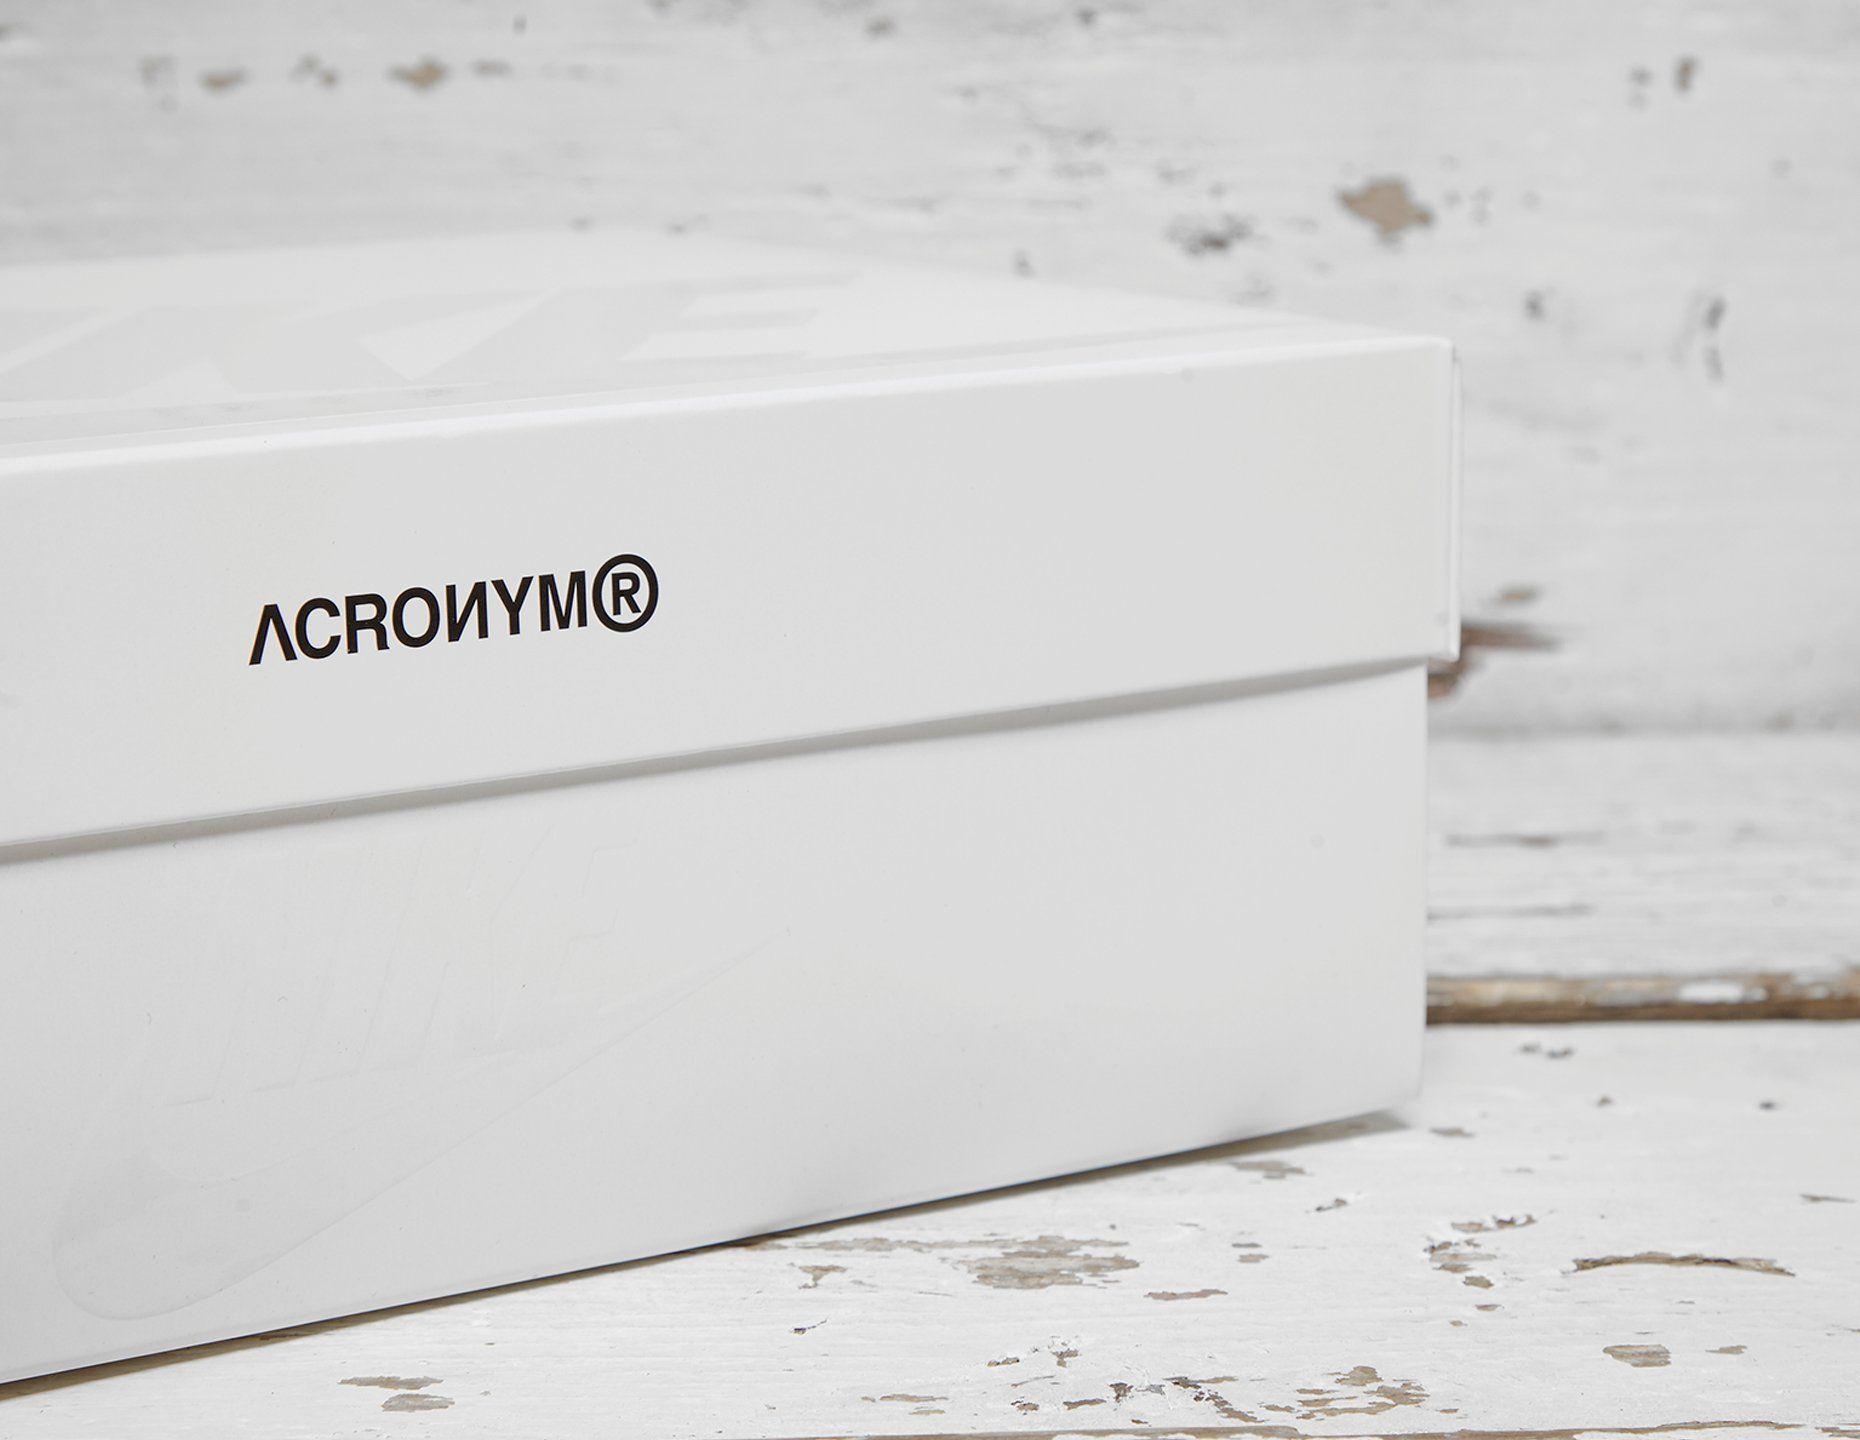 Nike x ACRONYM Air VaporMax Flyknit Moc 2